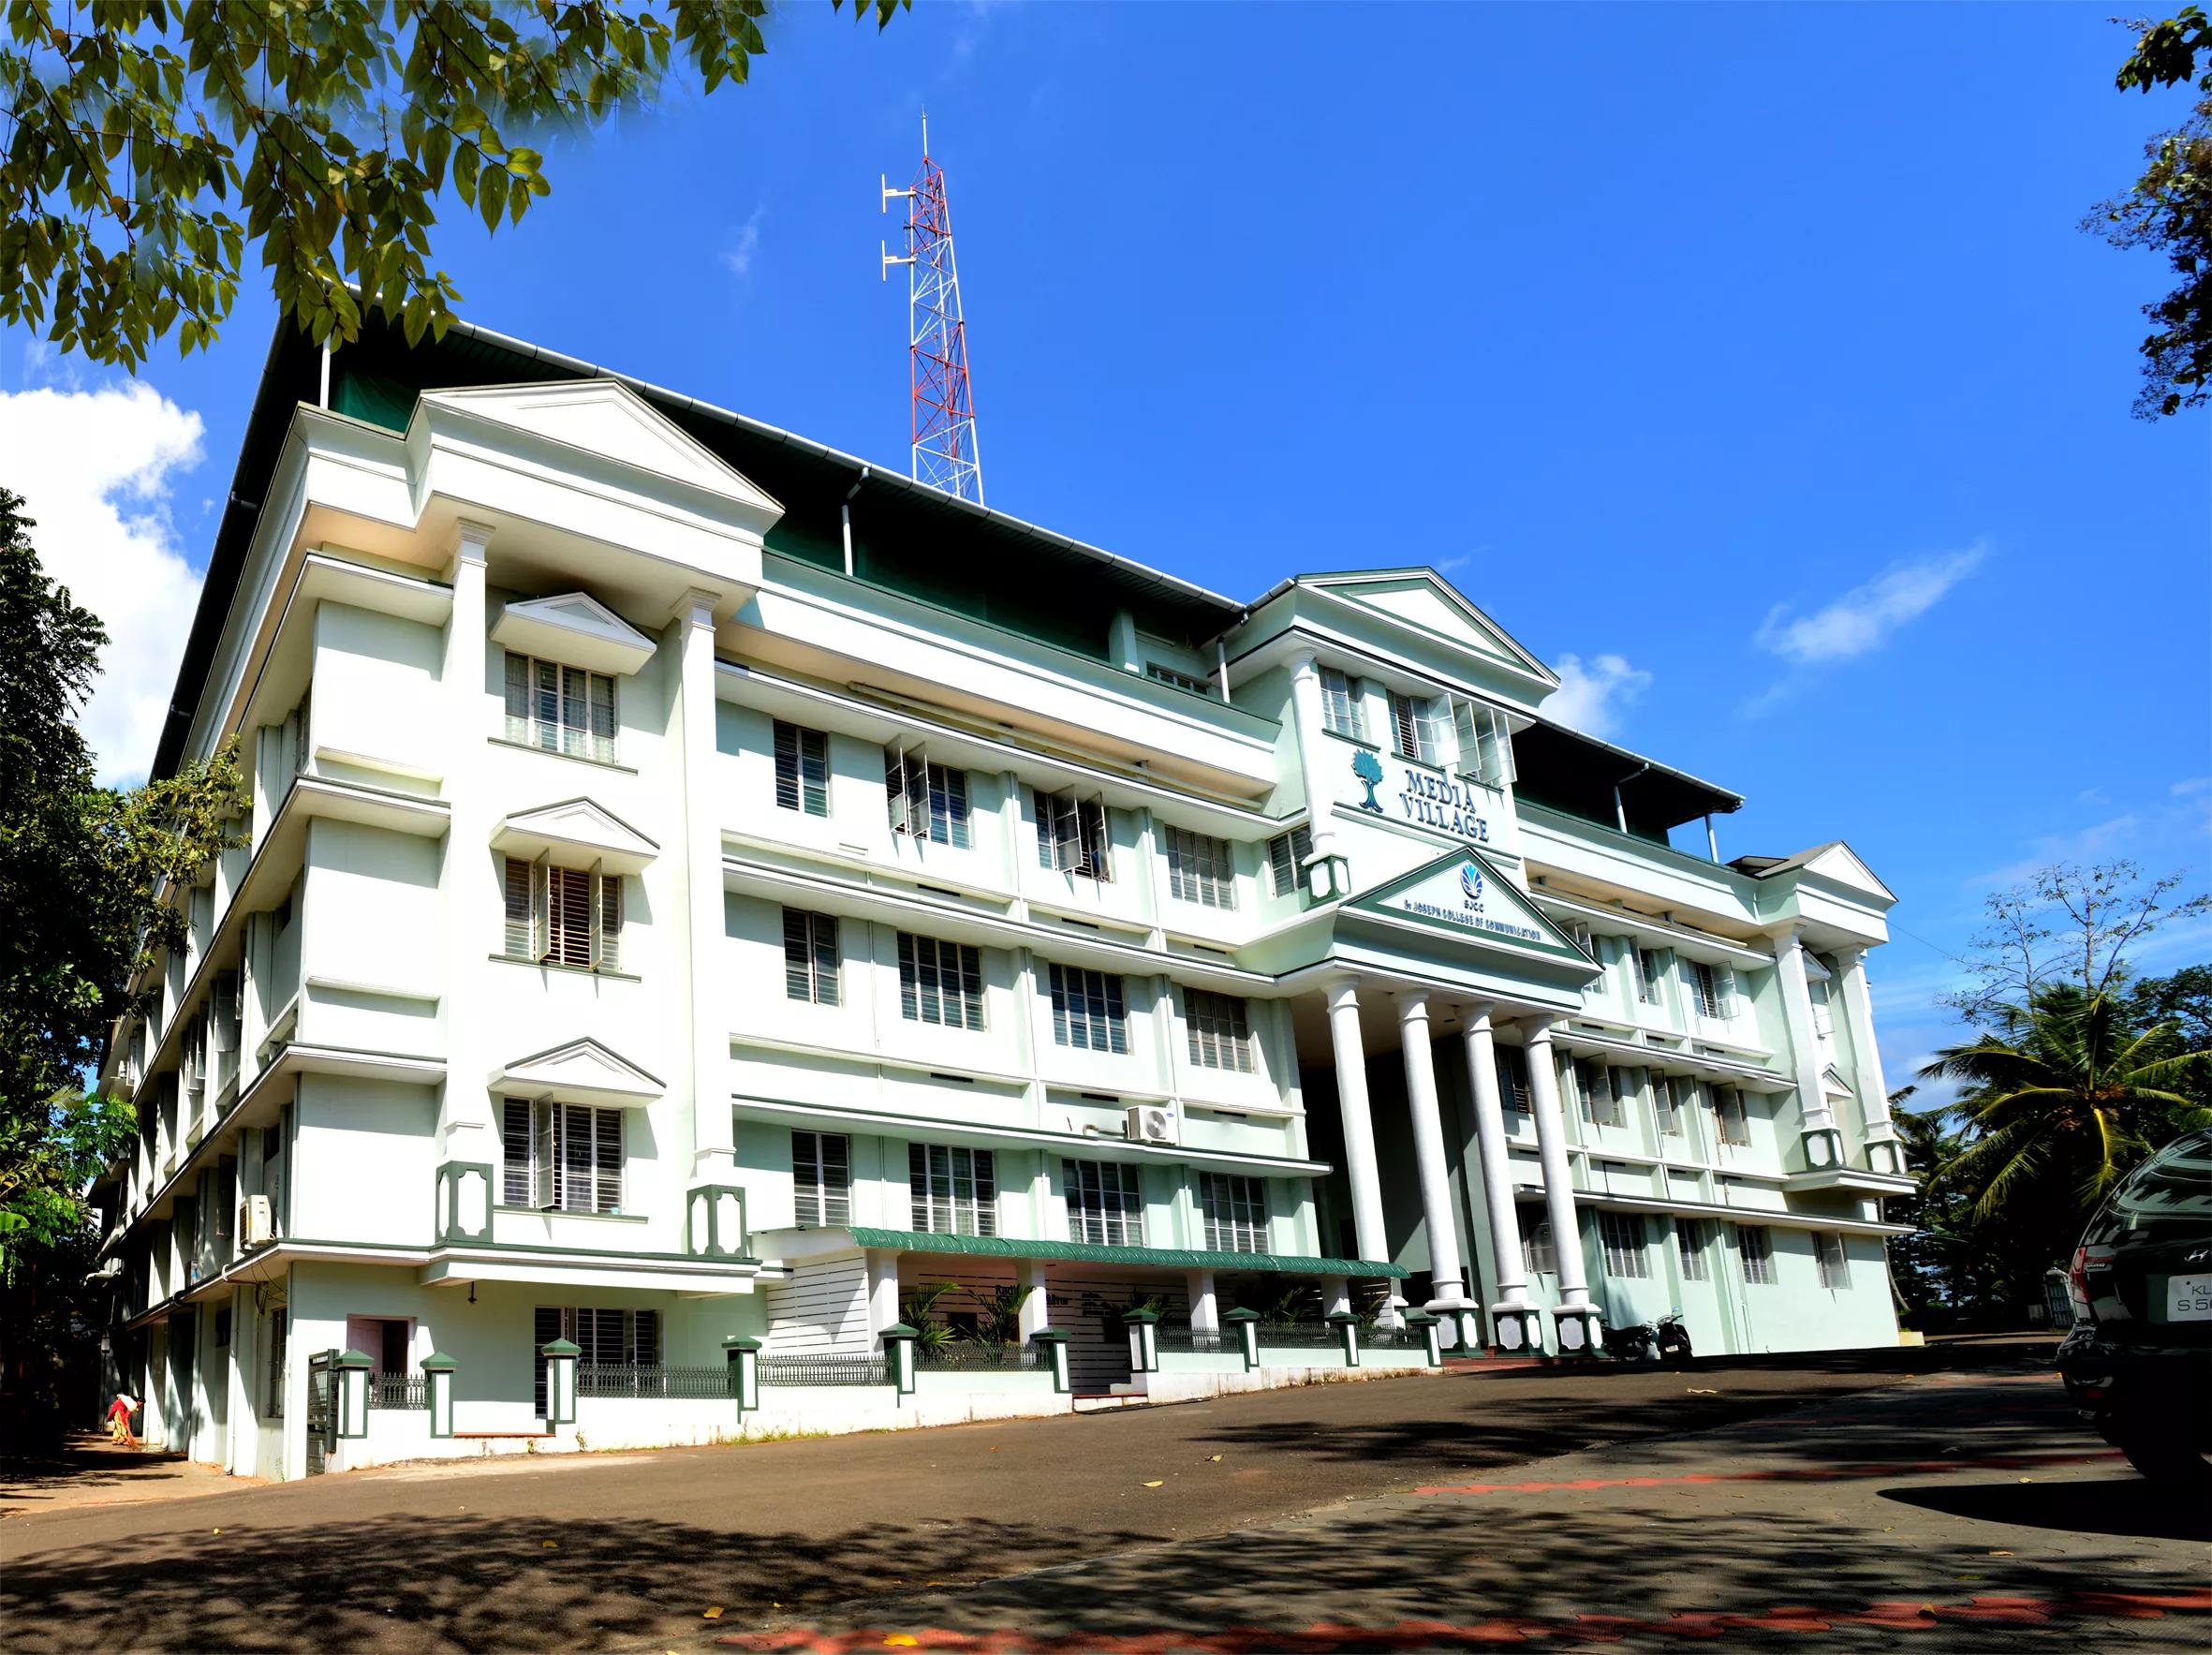 St. Joseph College of Communication, Kottayam